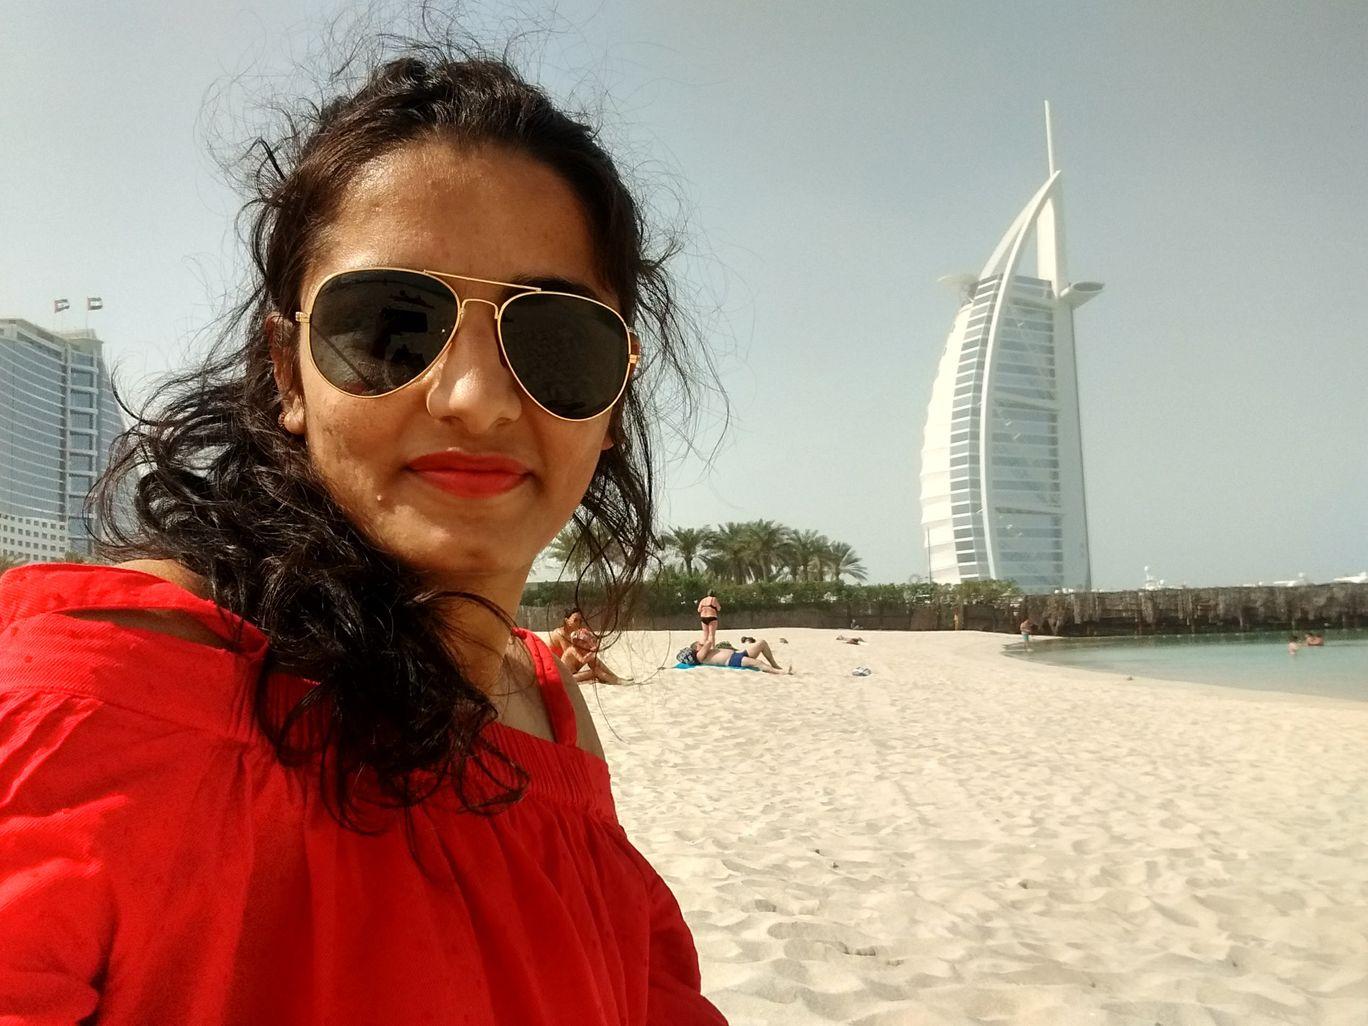 Photo of Burj Al Arab Jumeirah - Jumeirah Street - Dubai - United Arab Emirates By Kanchan Hansrajani